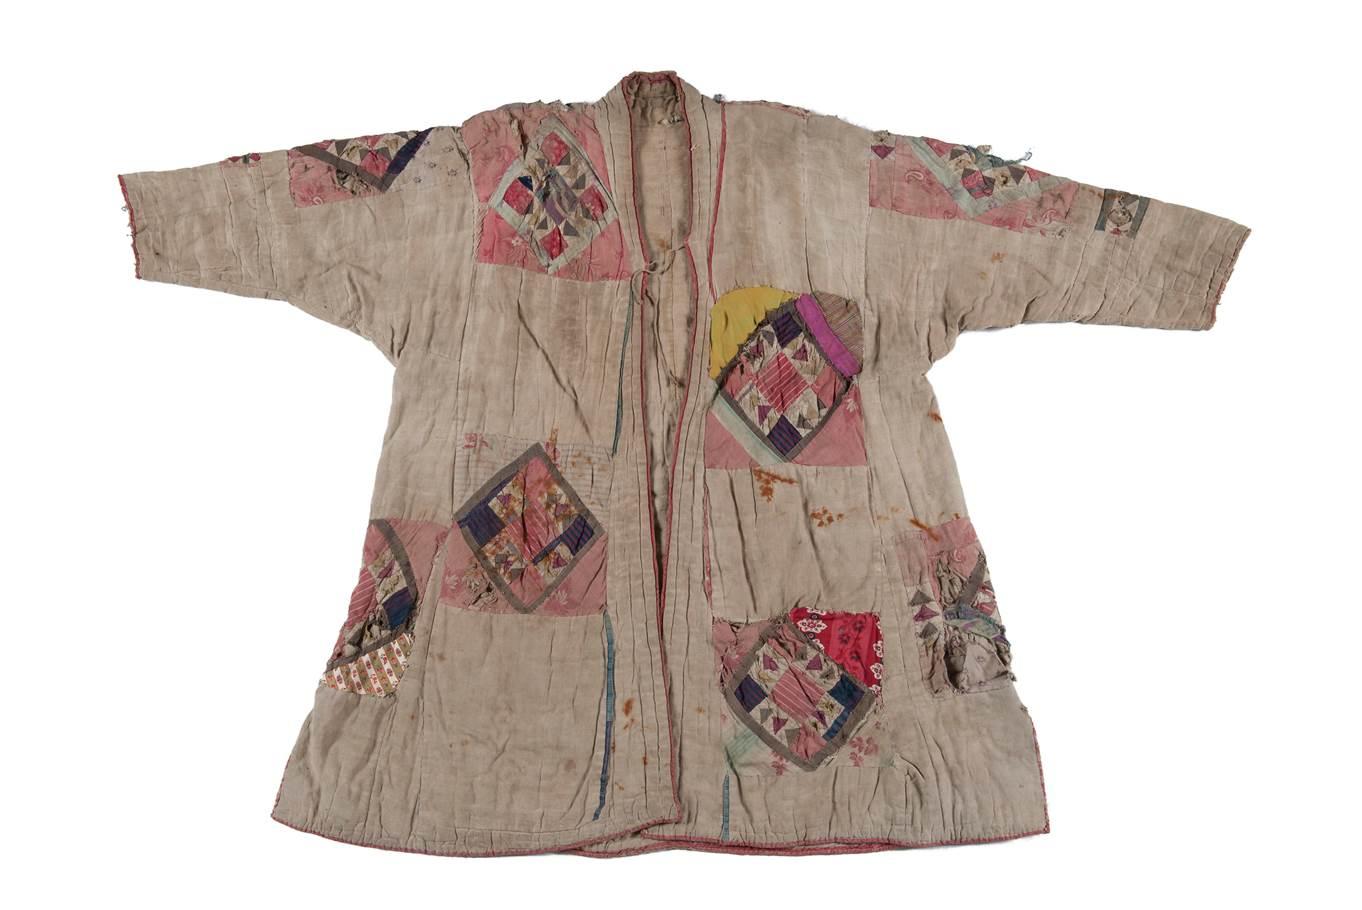 Soefi-mantel, muraqqa'a of khirq'a, Saoedi Arabië/Oezbekistan, vóór 1885, collectie Nationaal Museum van Wereldculturen.